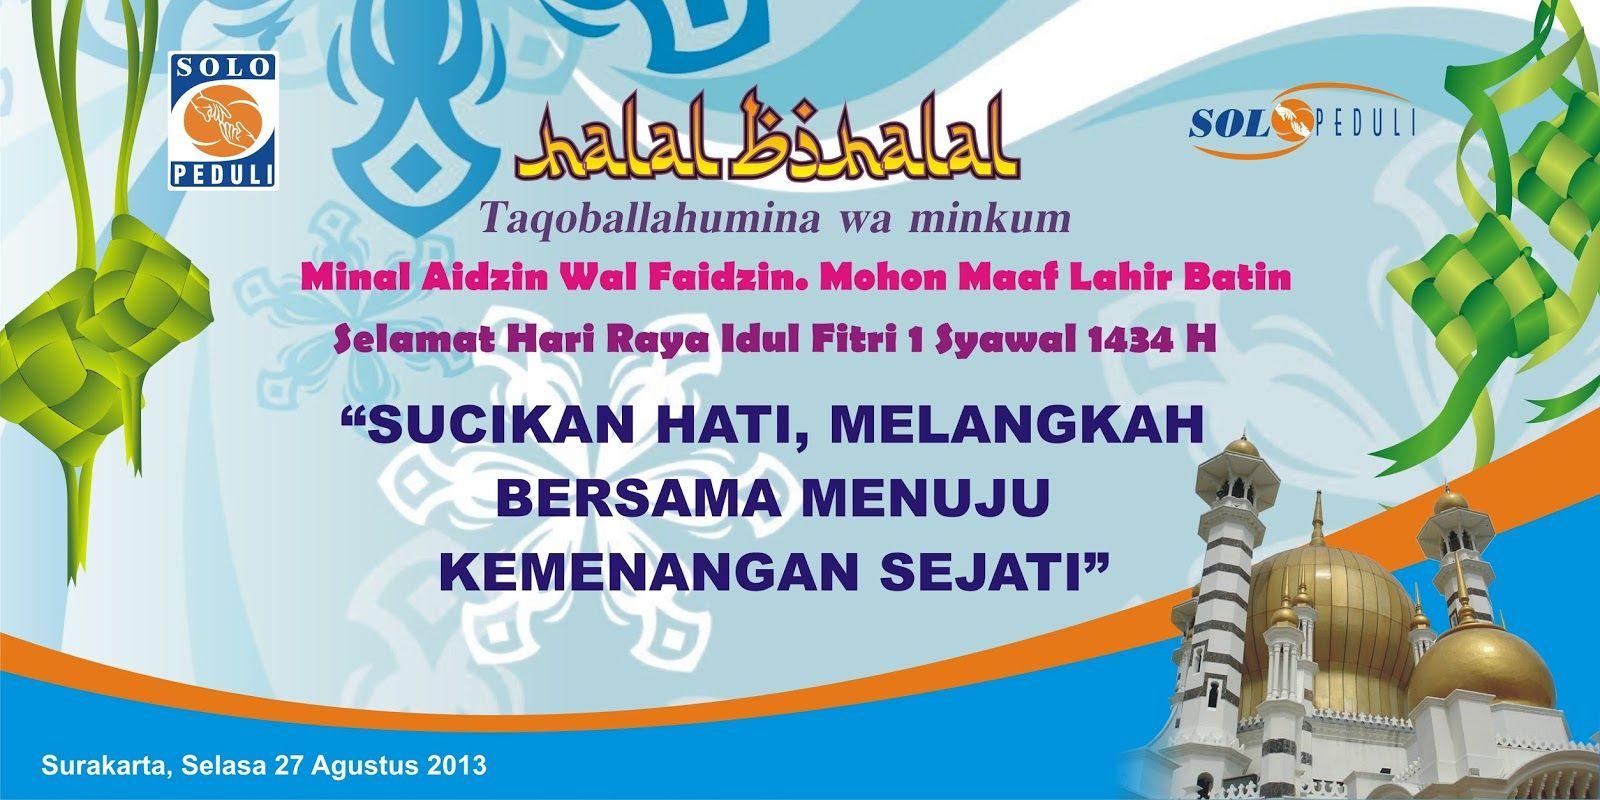 Hasil Gambar Untuk Backdrop Halal Bihalal Lampion Backdrops